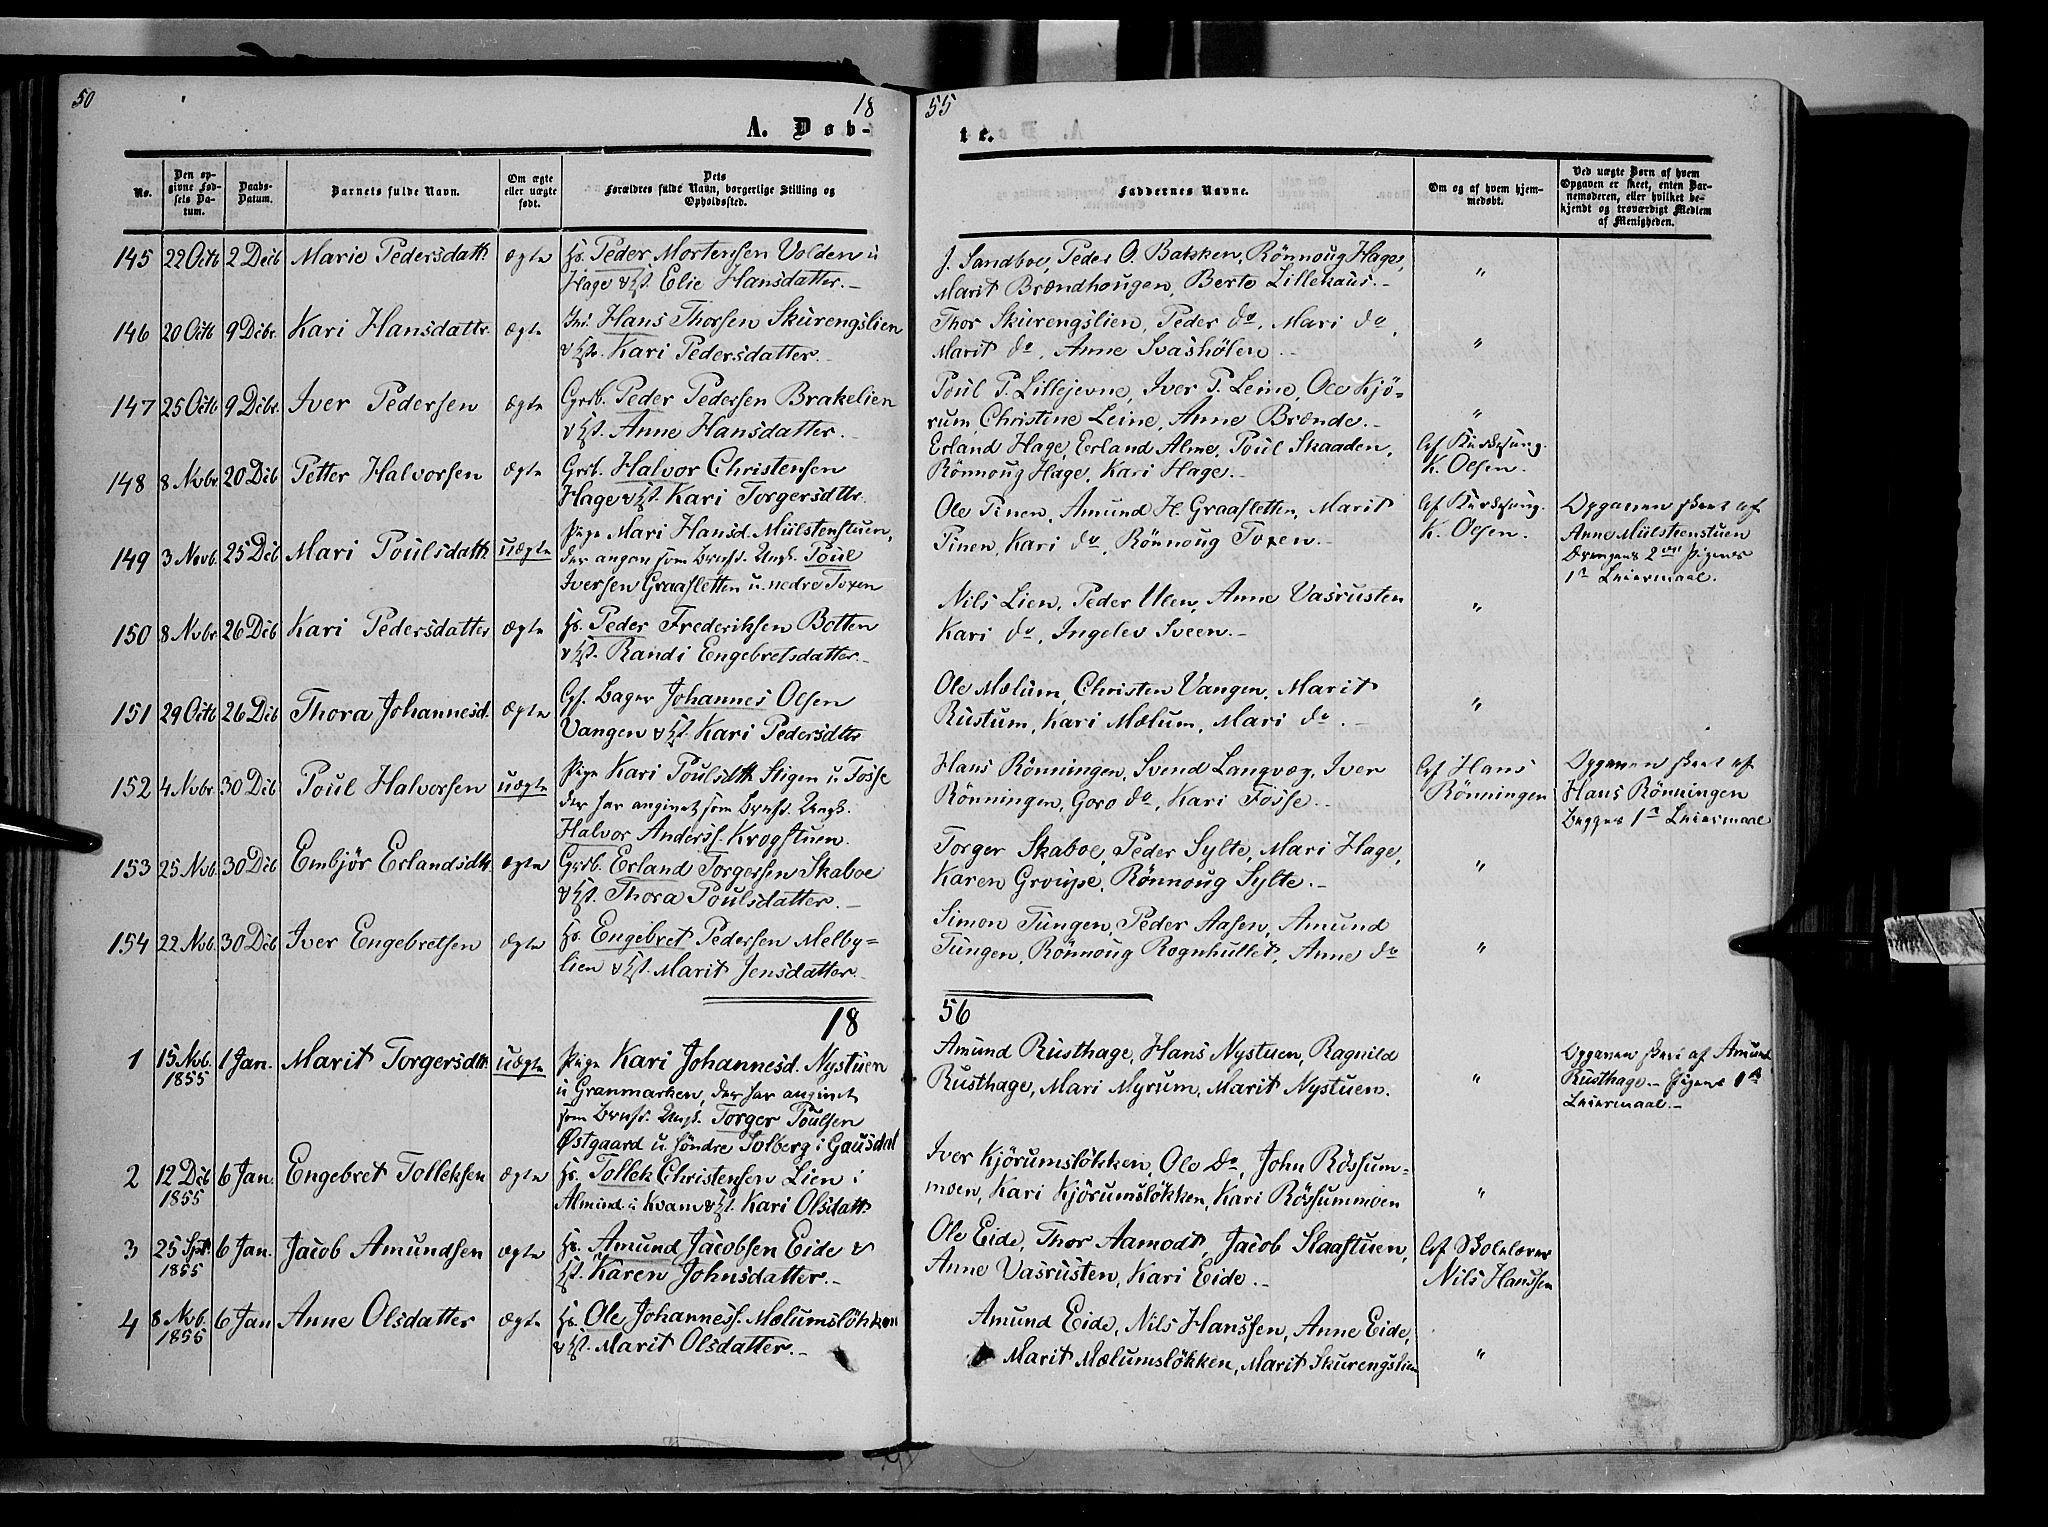 SAH, Nord-Fron prestekontor, Ministerialbok nr. 1, 1851-1864, s. 50